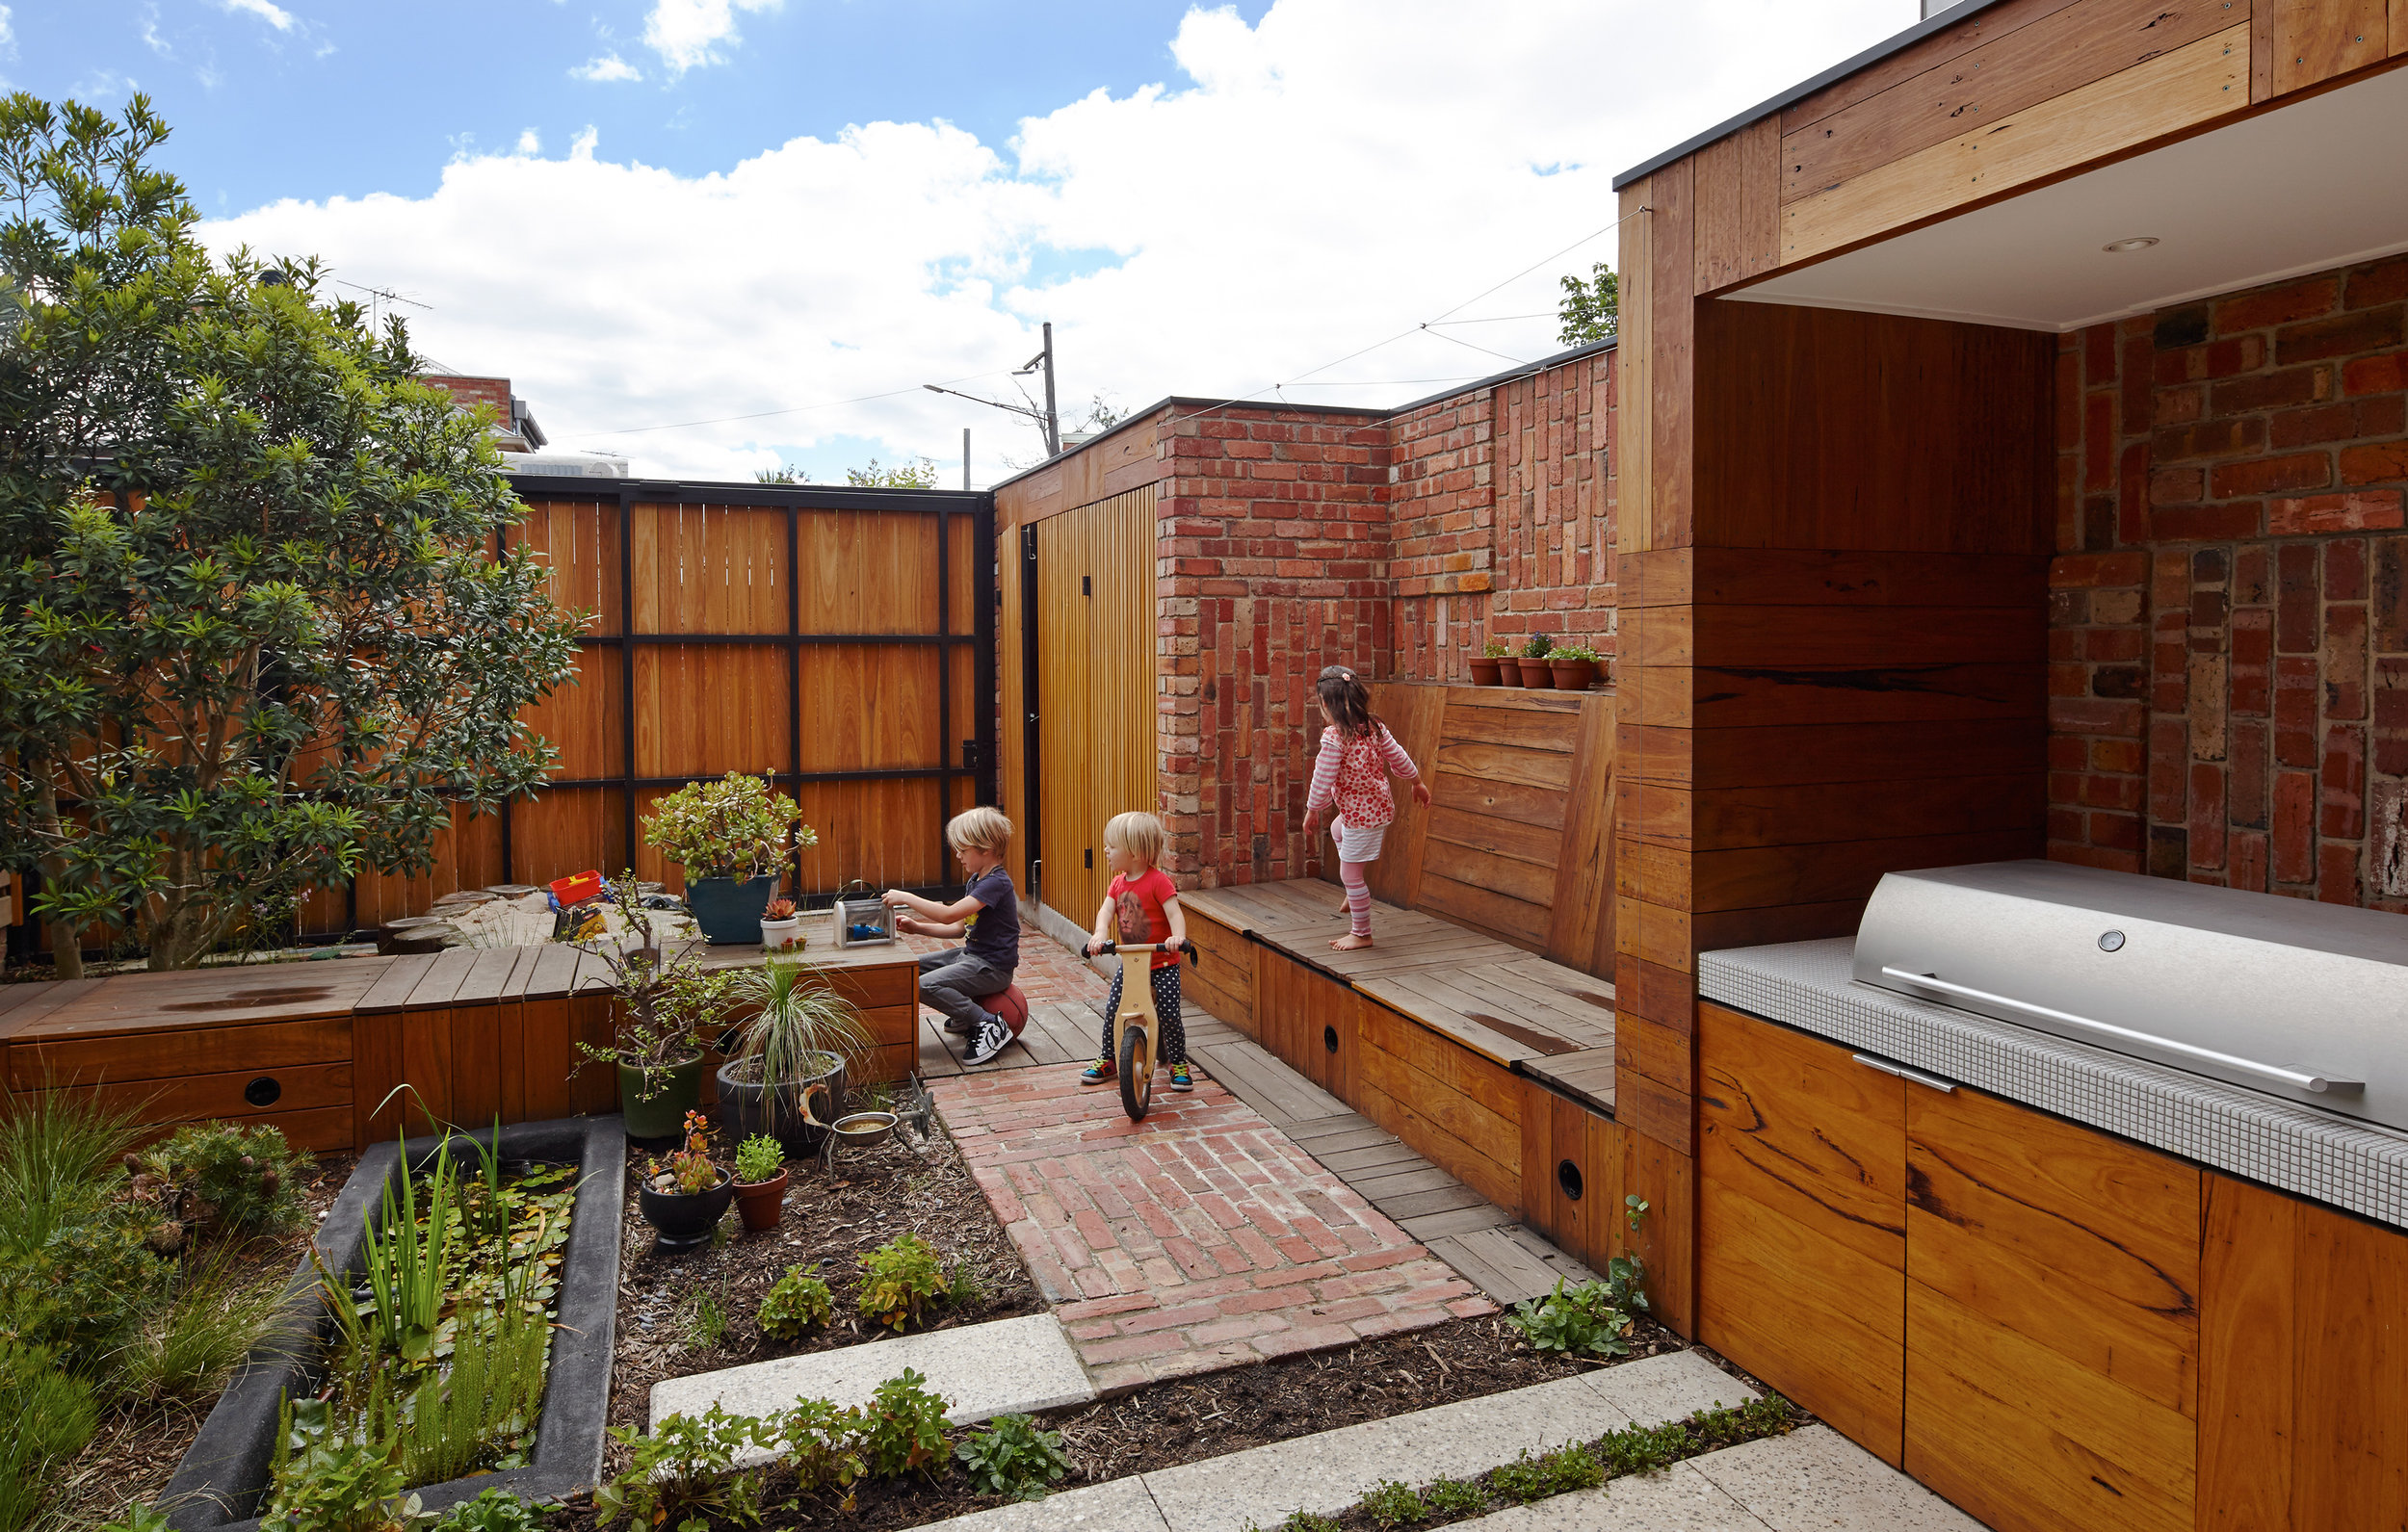 cubo-house-phooey-architects-the-design-emotive-15.jpg